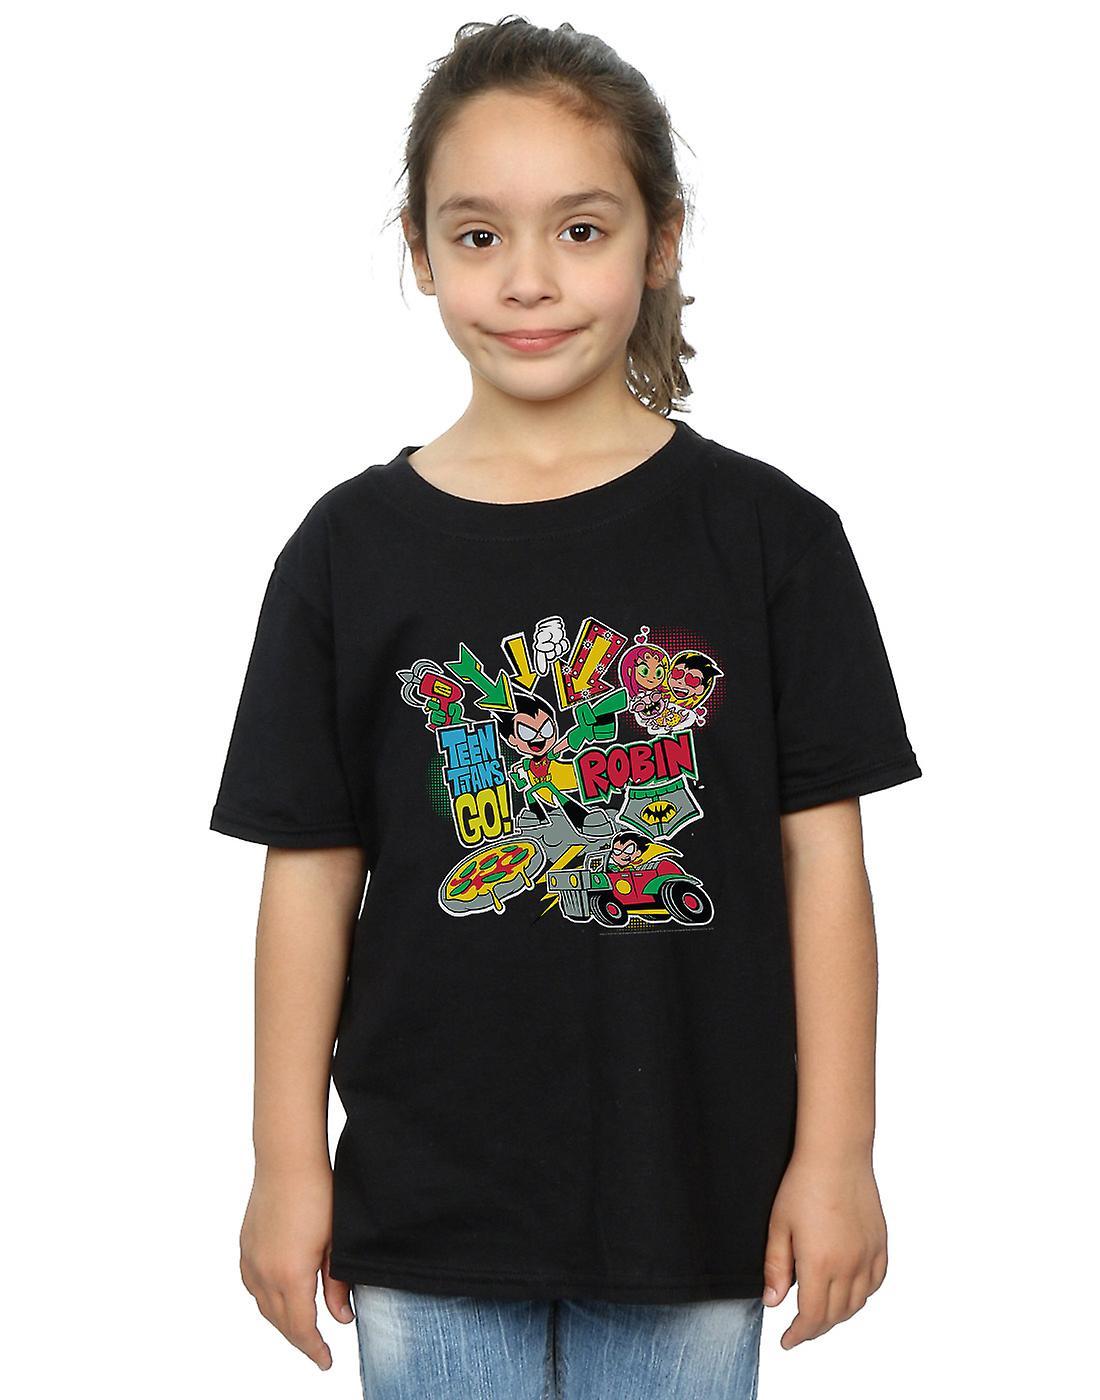 DC Comics Girls Teen Titans Go Robin Montage T-Shirt